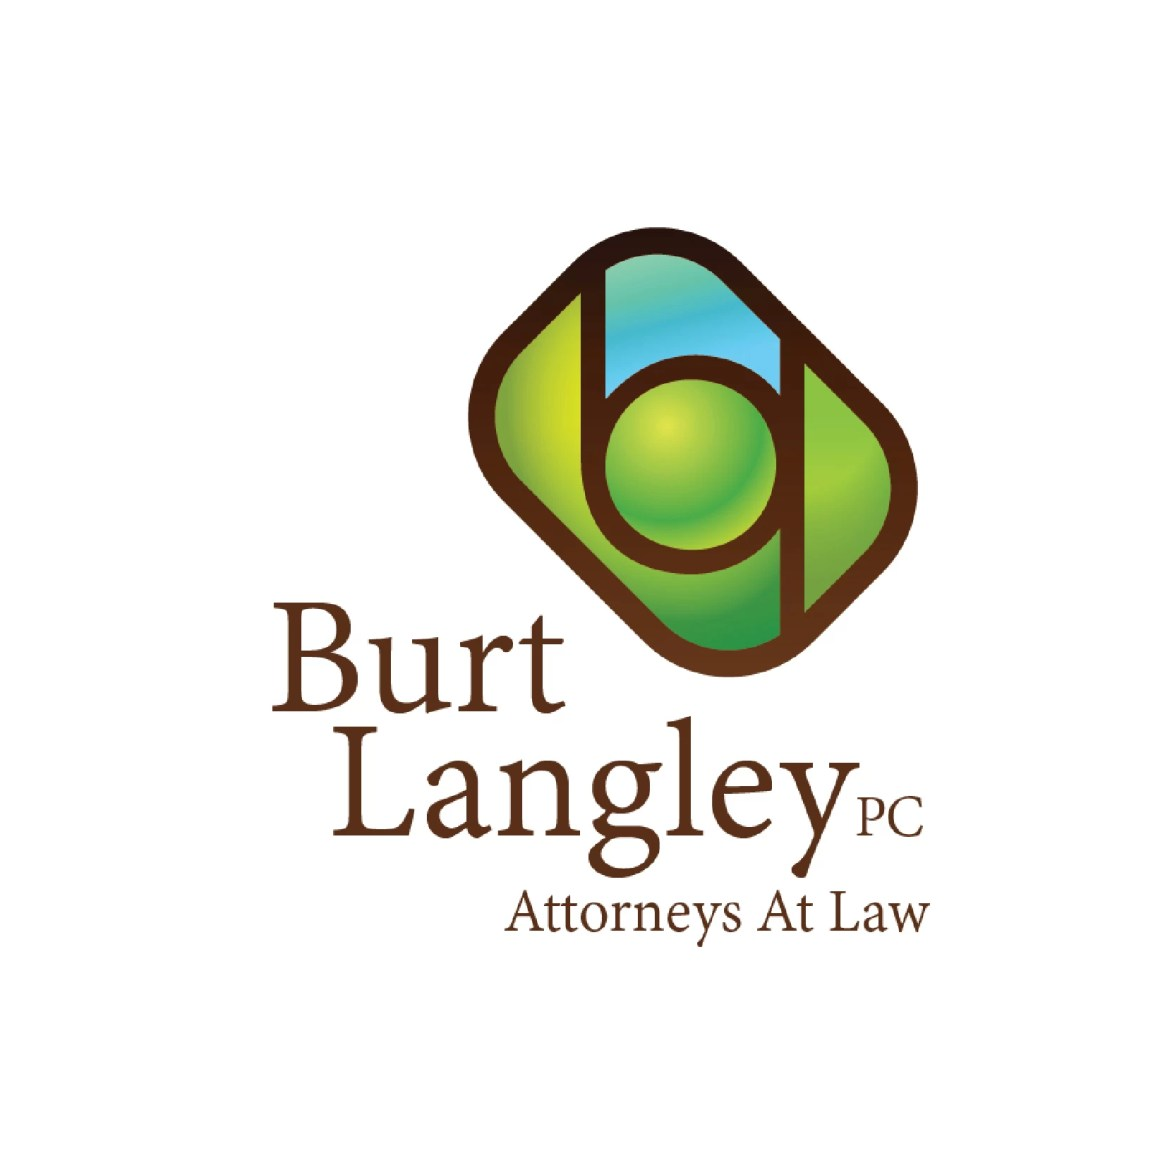 Burt Langley PC Attorneys At Law Logo